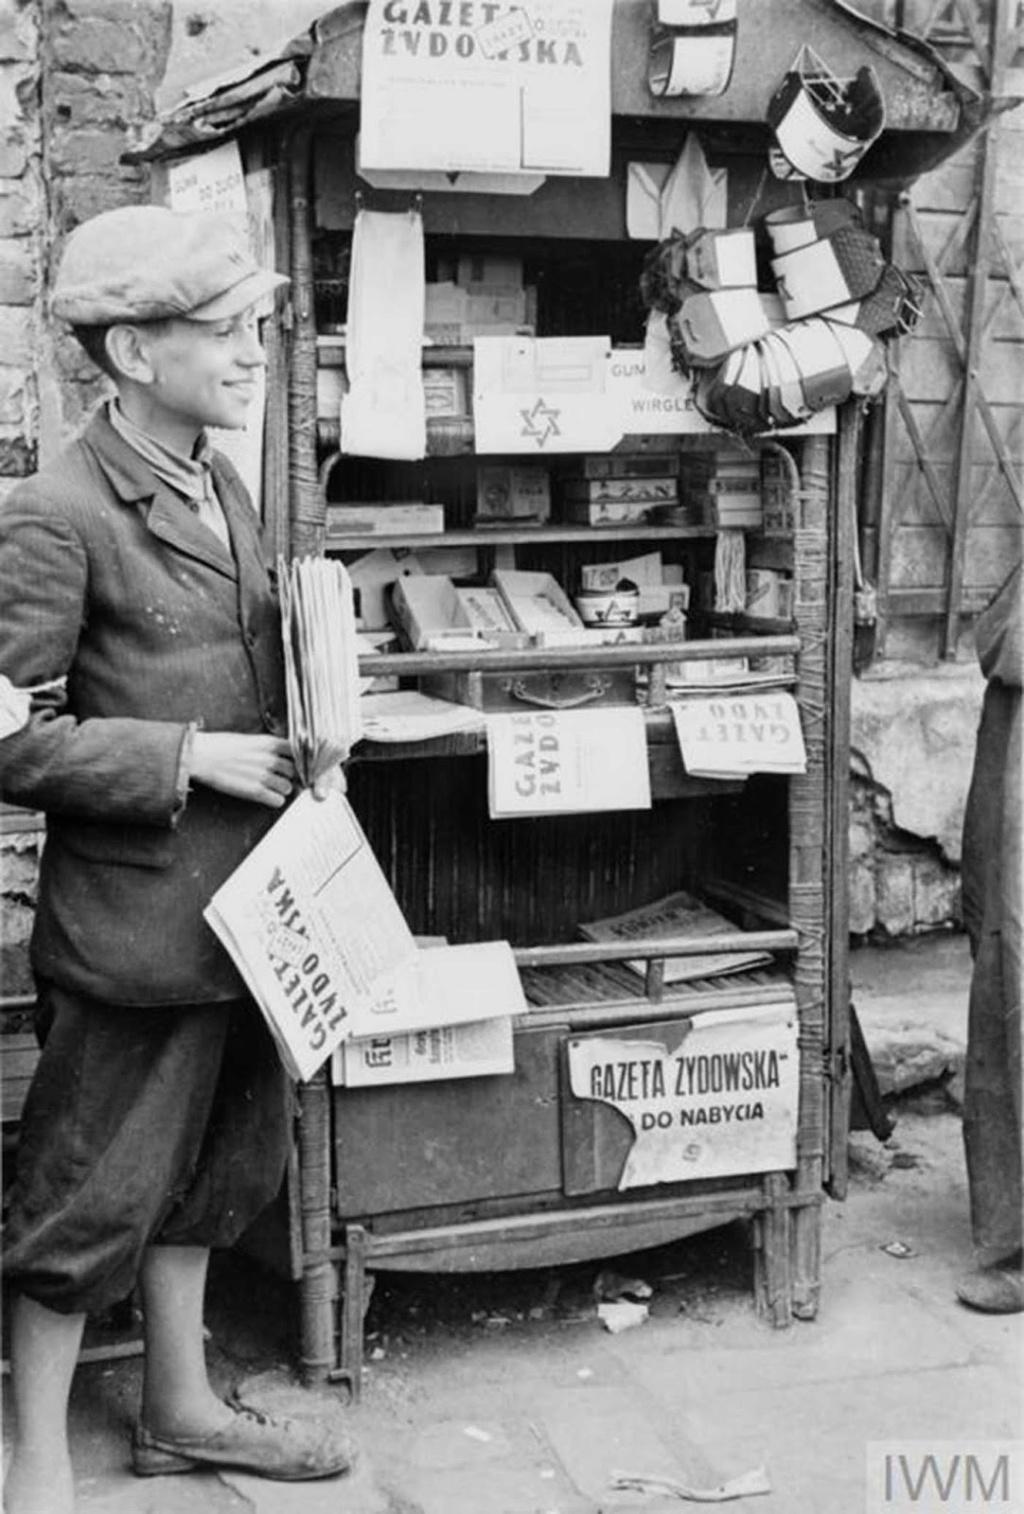 Diverses photos de la WWII - Page 40 94811